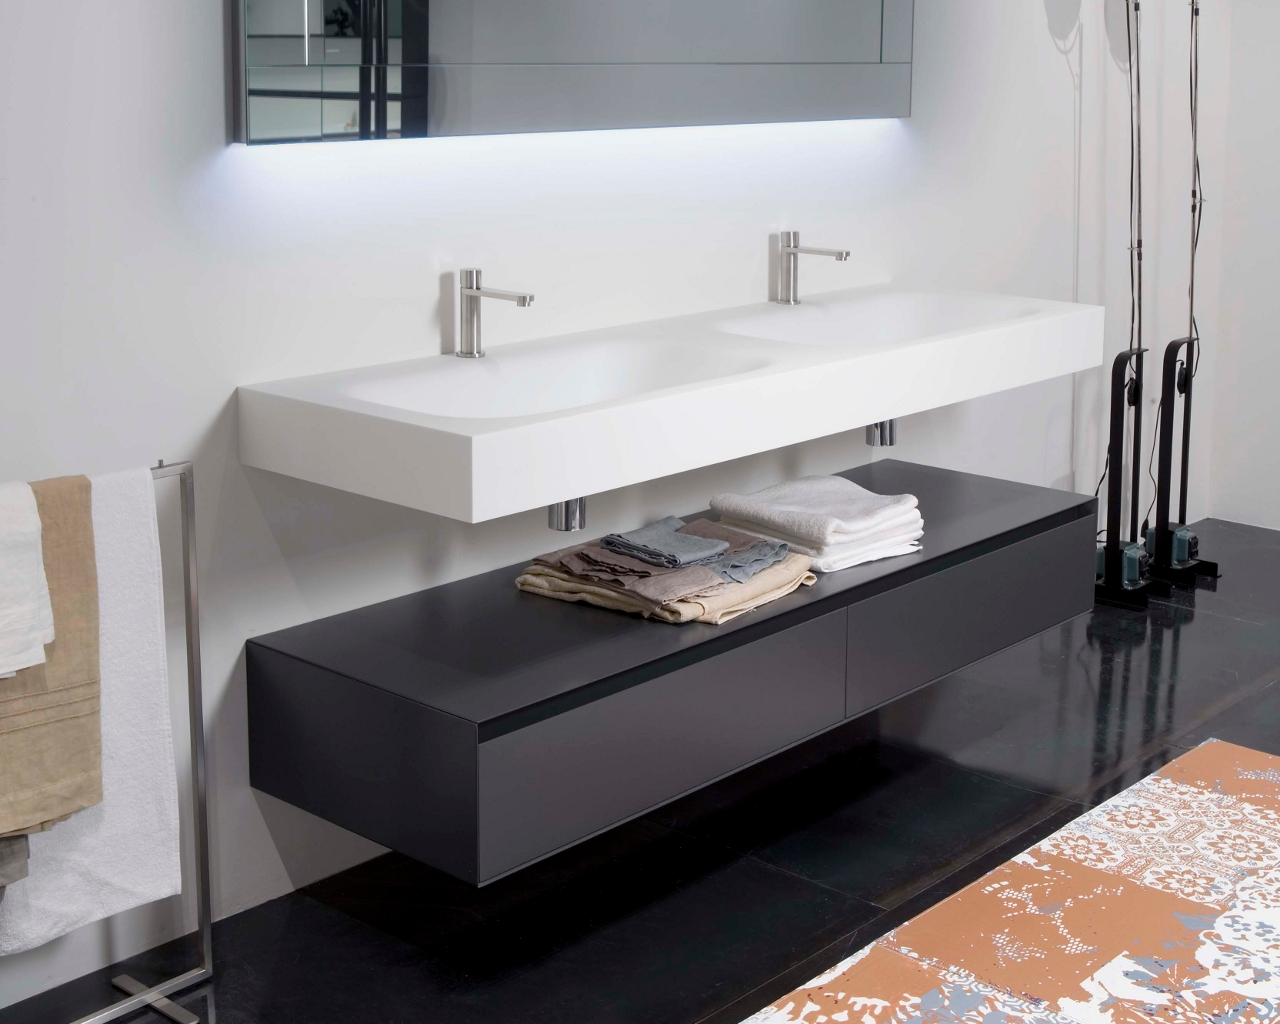 Arredo bagno zibido san giacomo design casa creativa e mobili ispiratori - Arredo bagno lucca ...